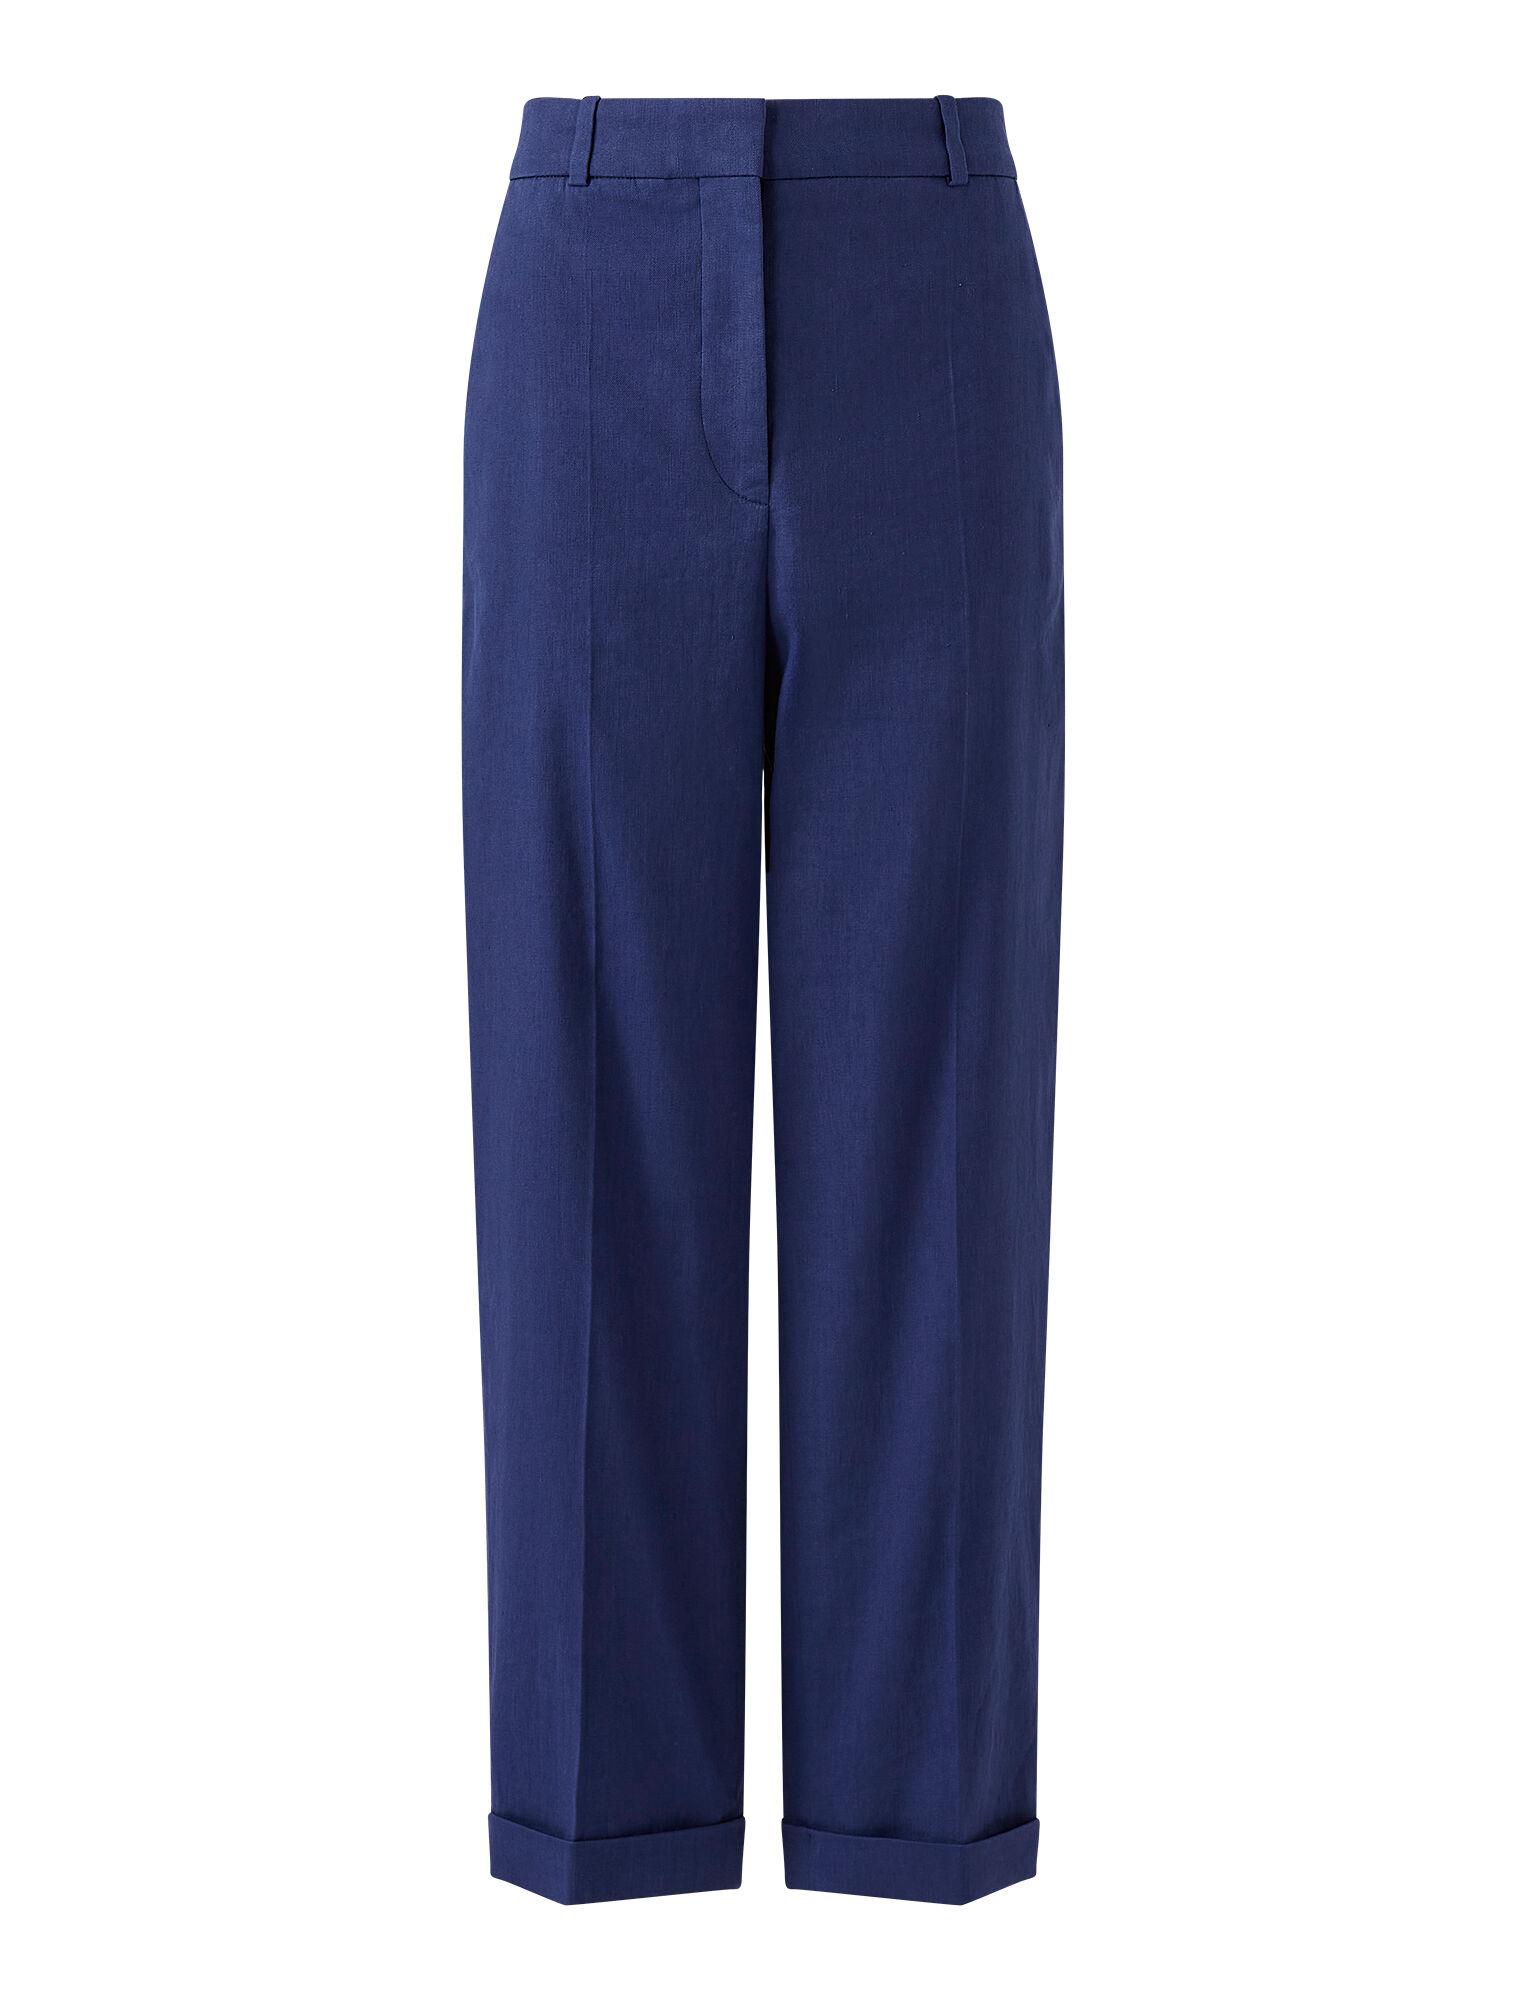 Joseph, Stretch Linen Cotton Trina Trousers, in COBALT BLUE